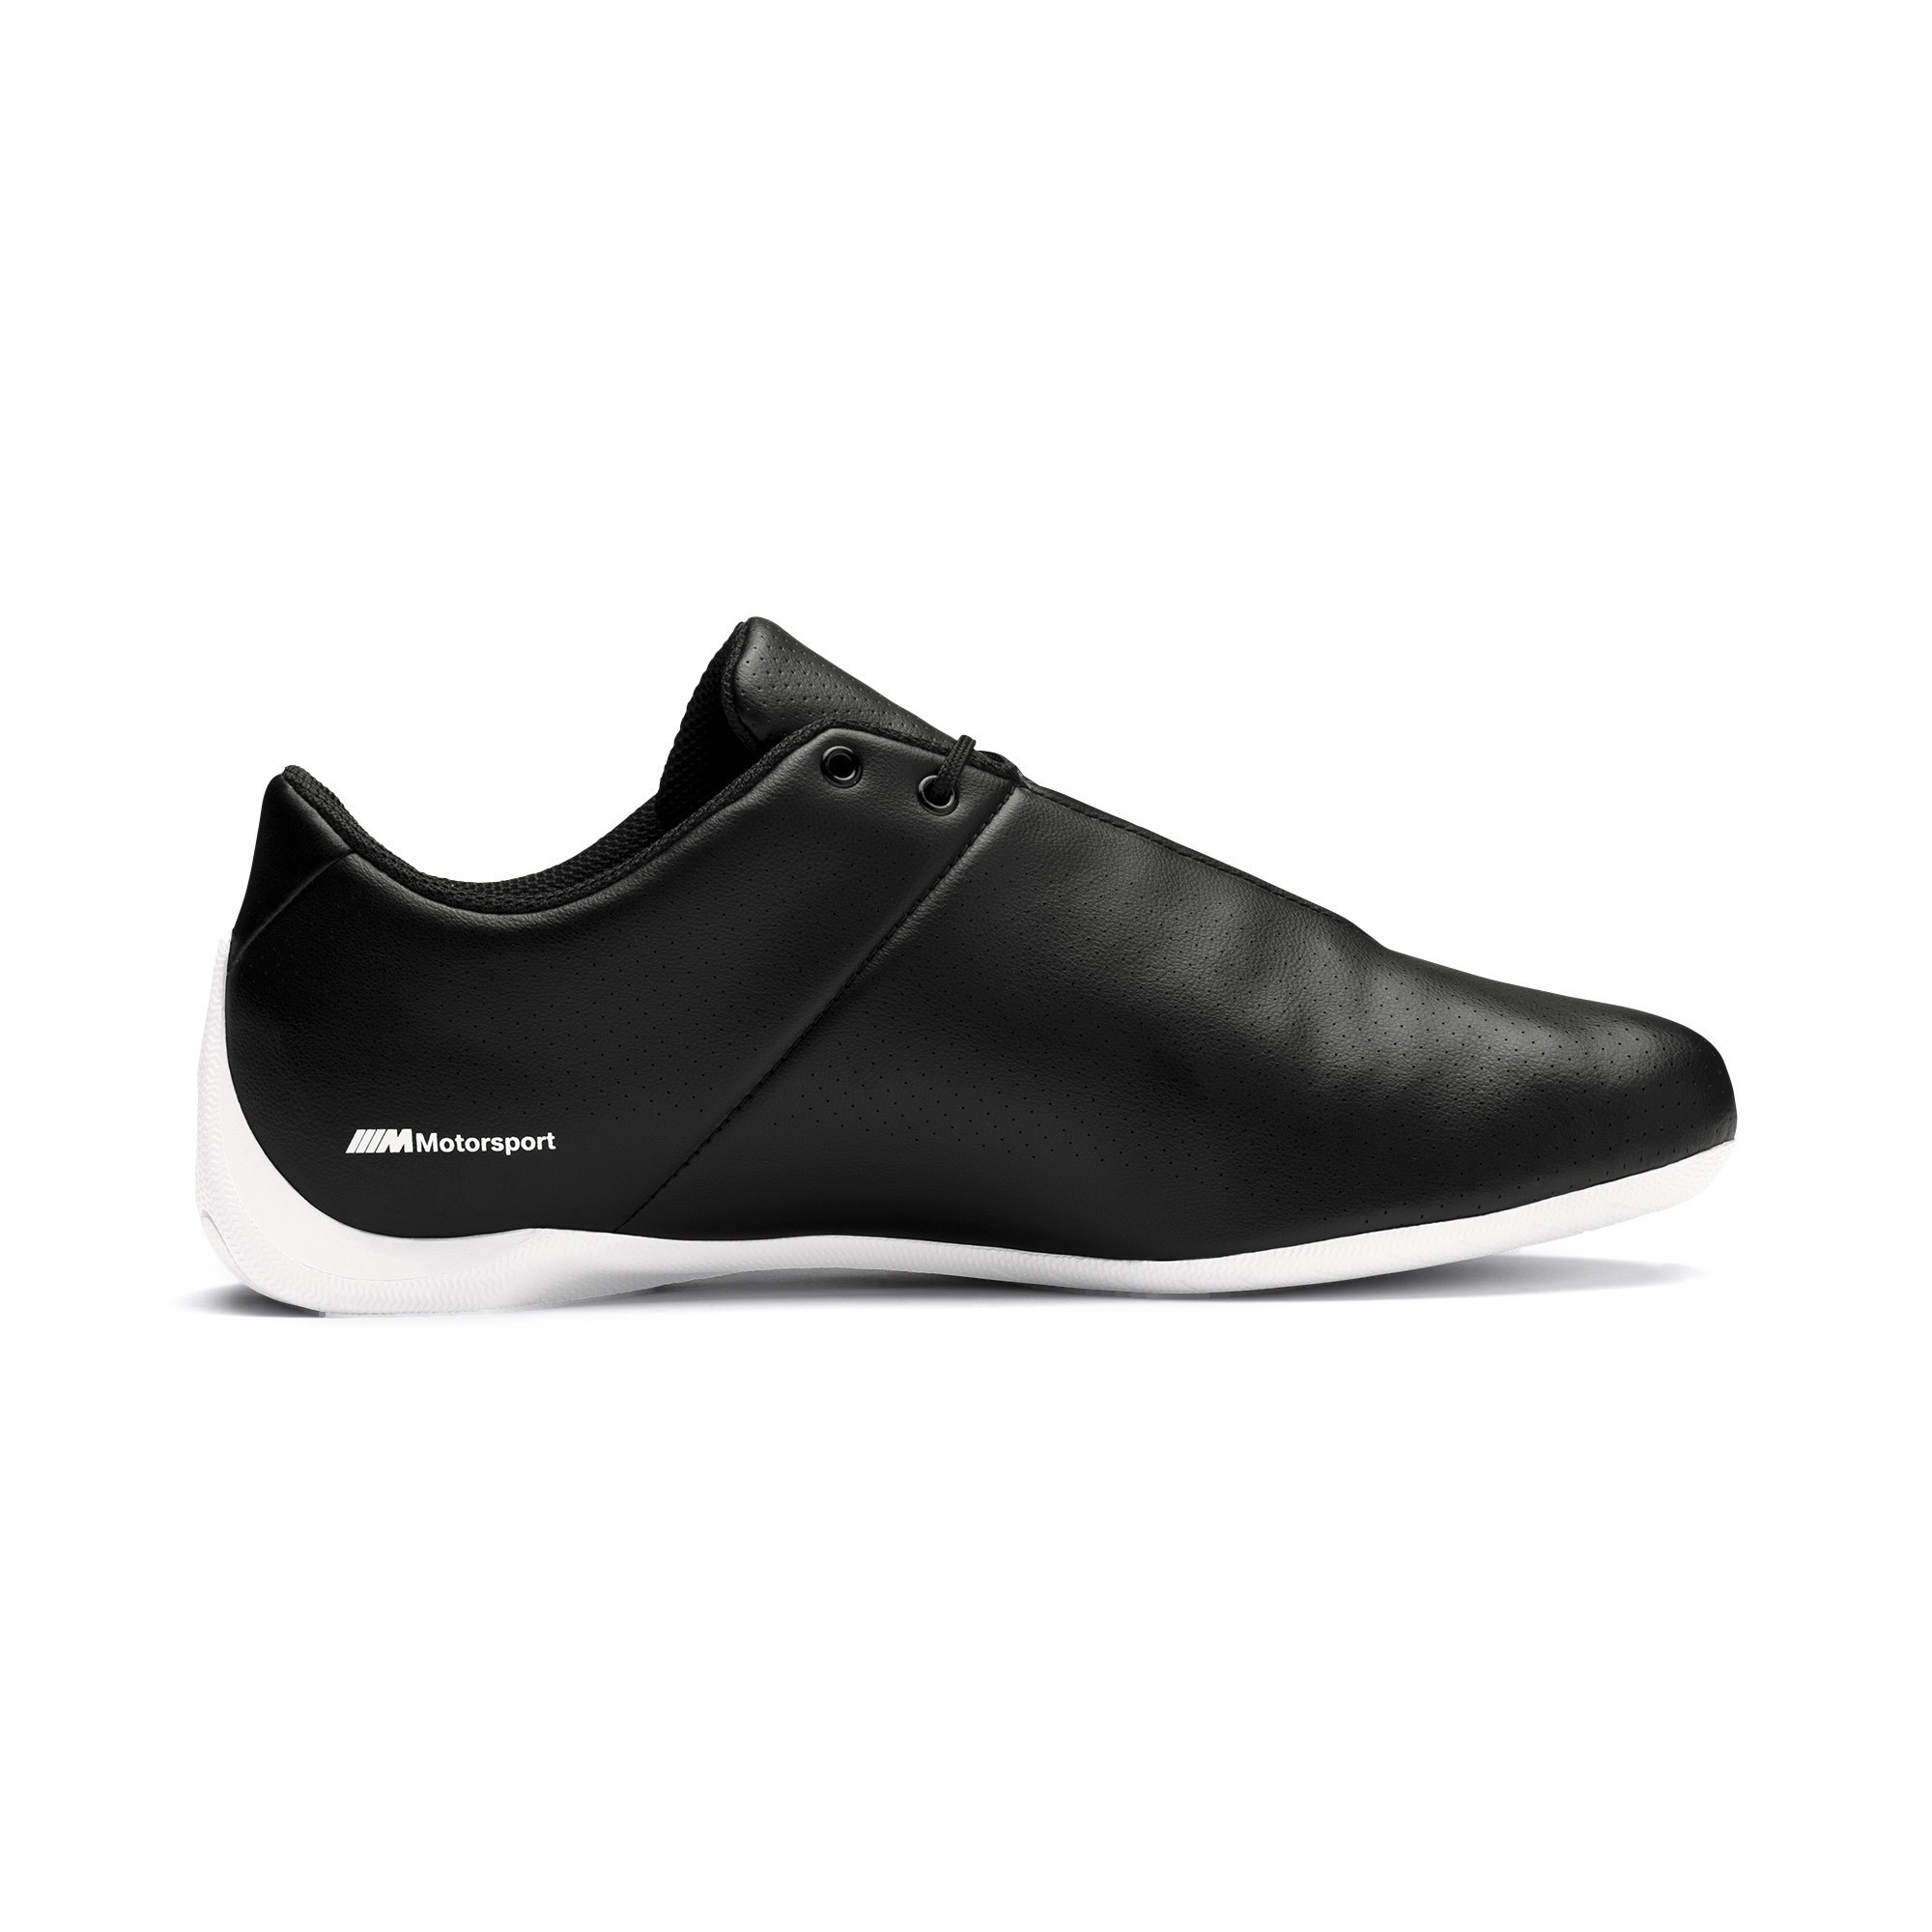 Indexbild 16 - PUMA BMW M Motorsport Future Cat Ultra Sneaker Unisex Schuhe Neu